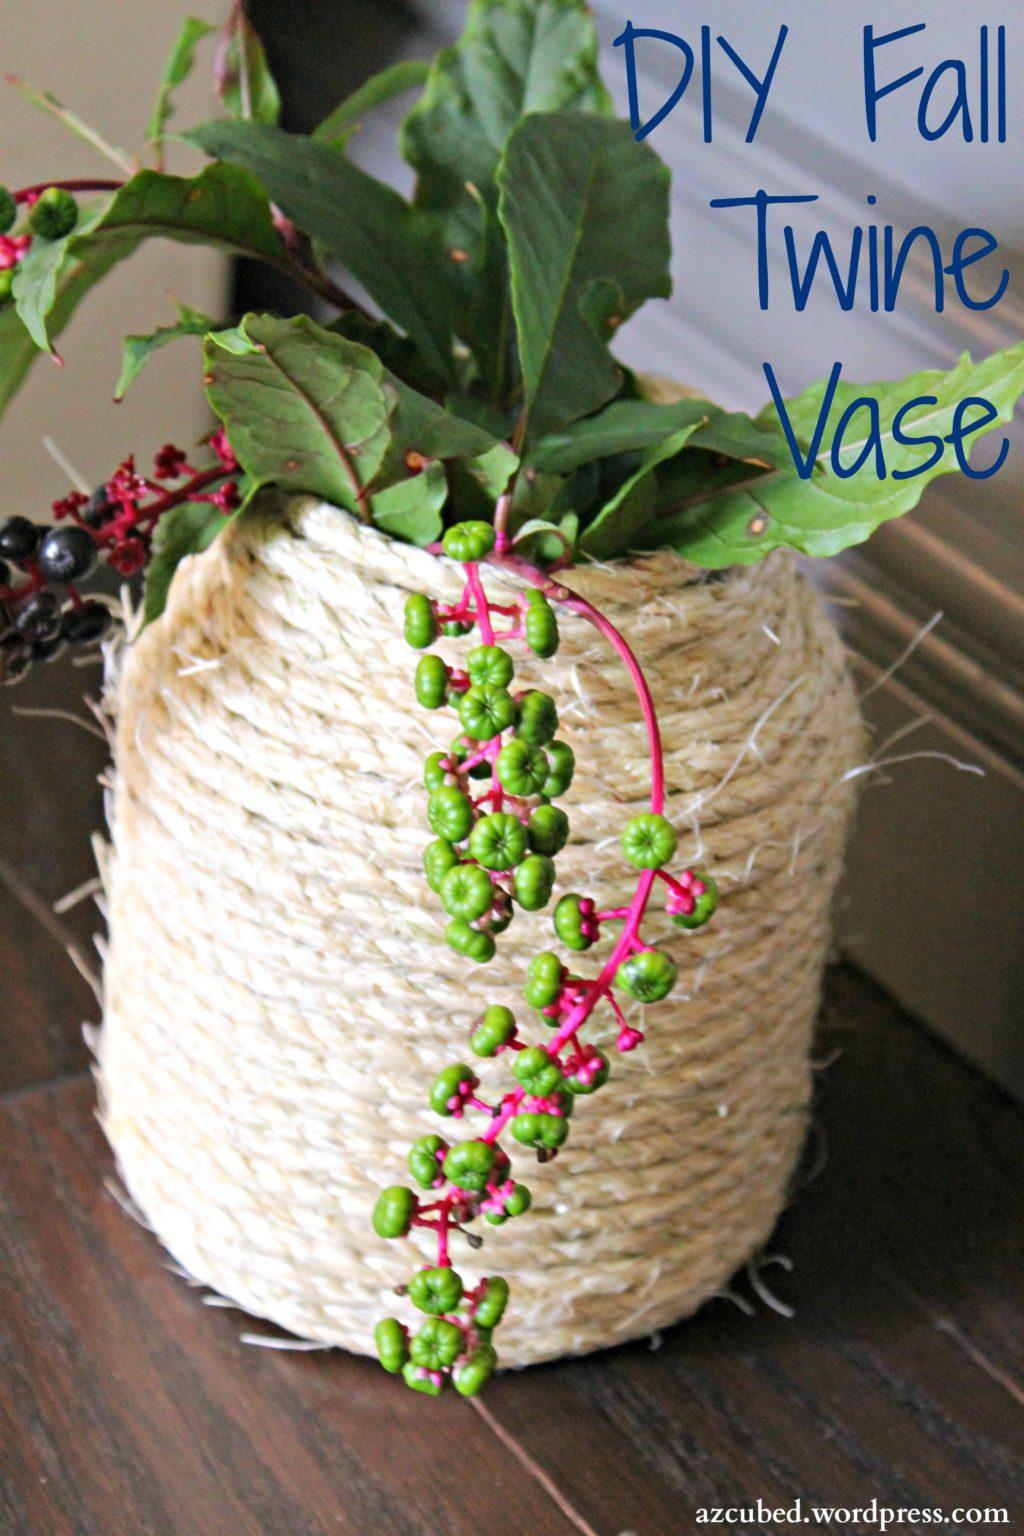 DIY Fall Twine Vase